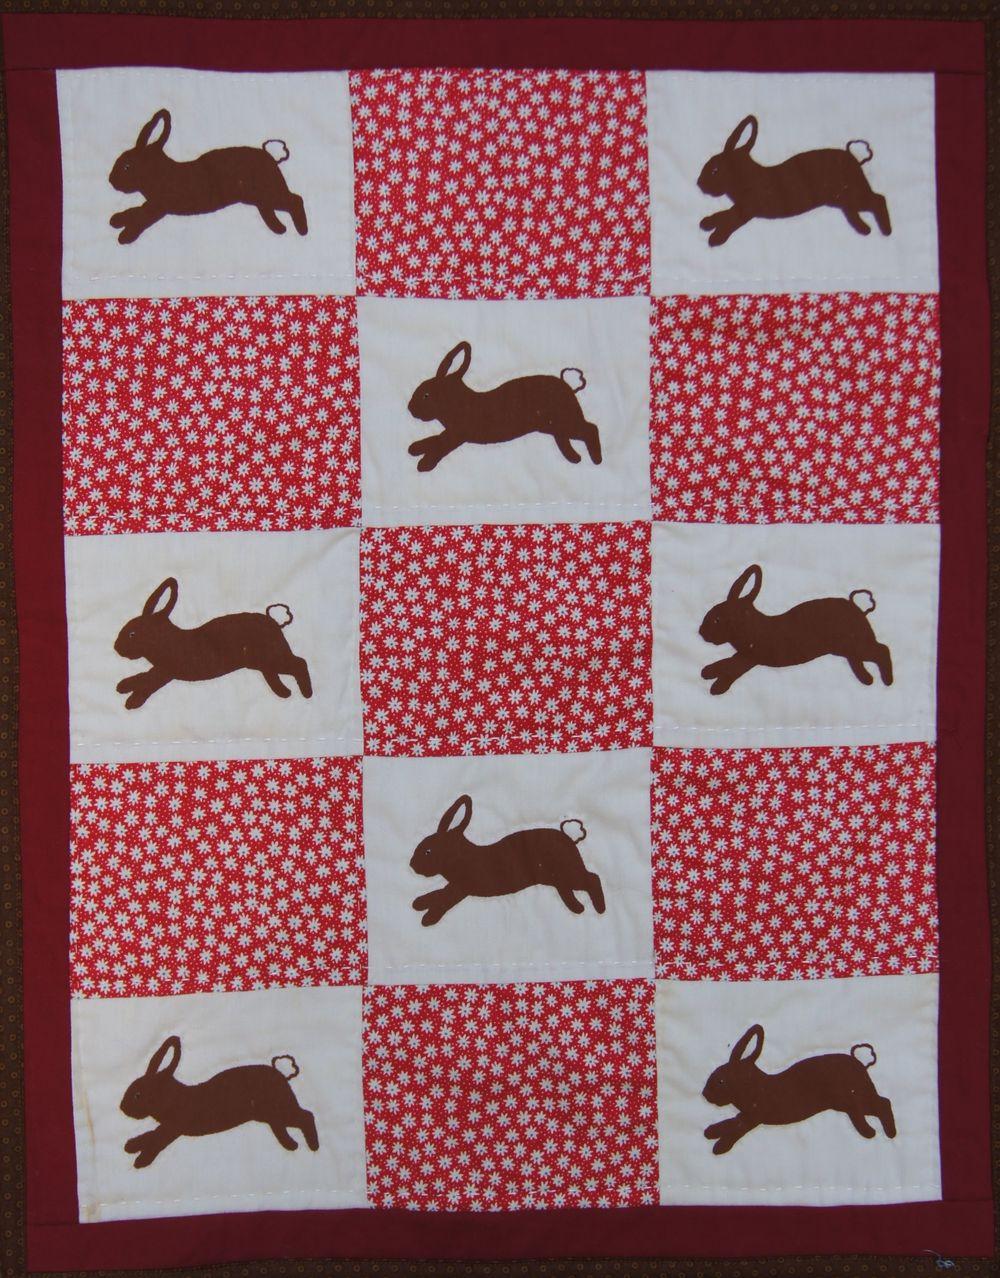 Quilt Bunny Hopping Joy Quilt.jpg